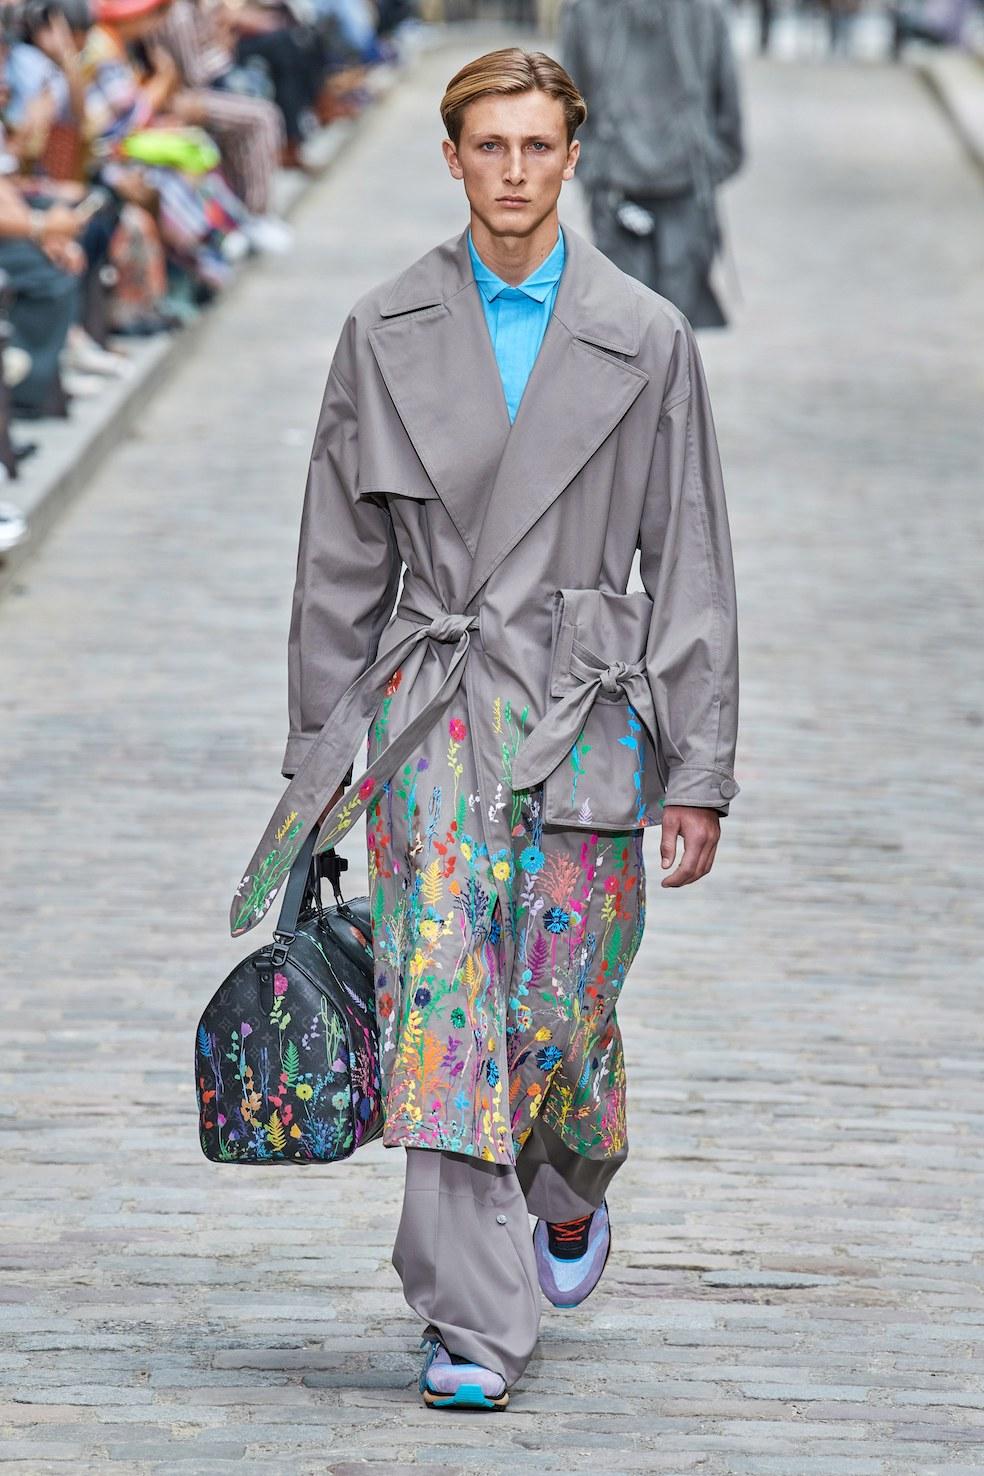 Louis_Vuitton_SS20_Behind_The_Blinds_Magazine__FIO0404.jpg